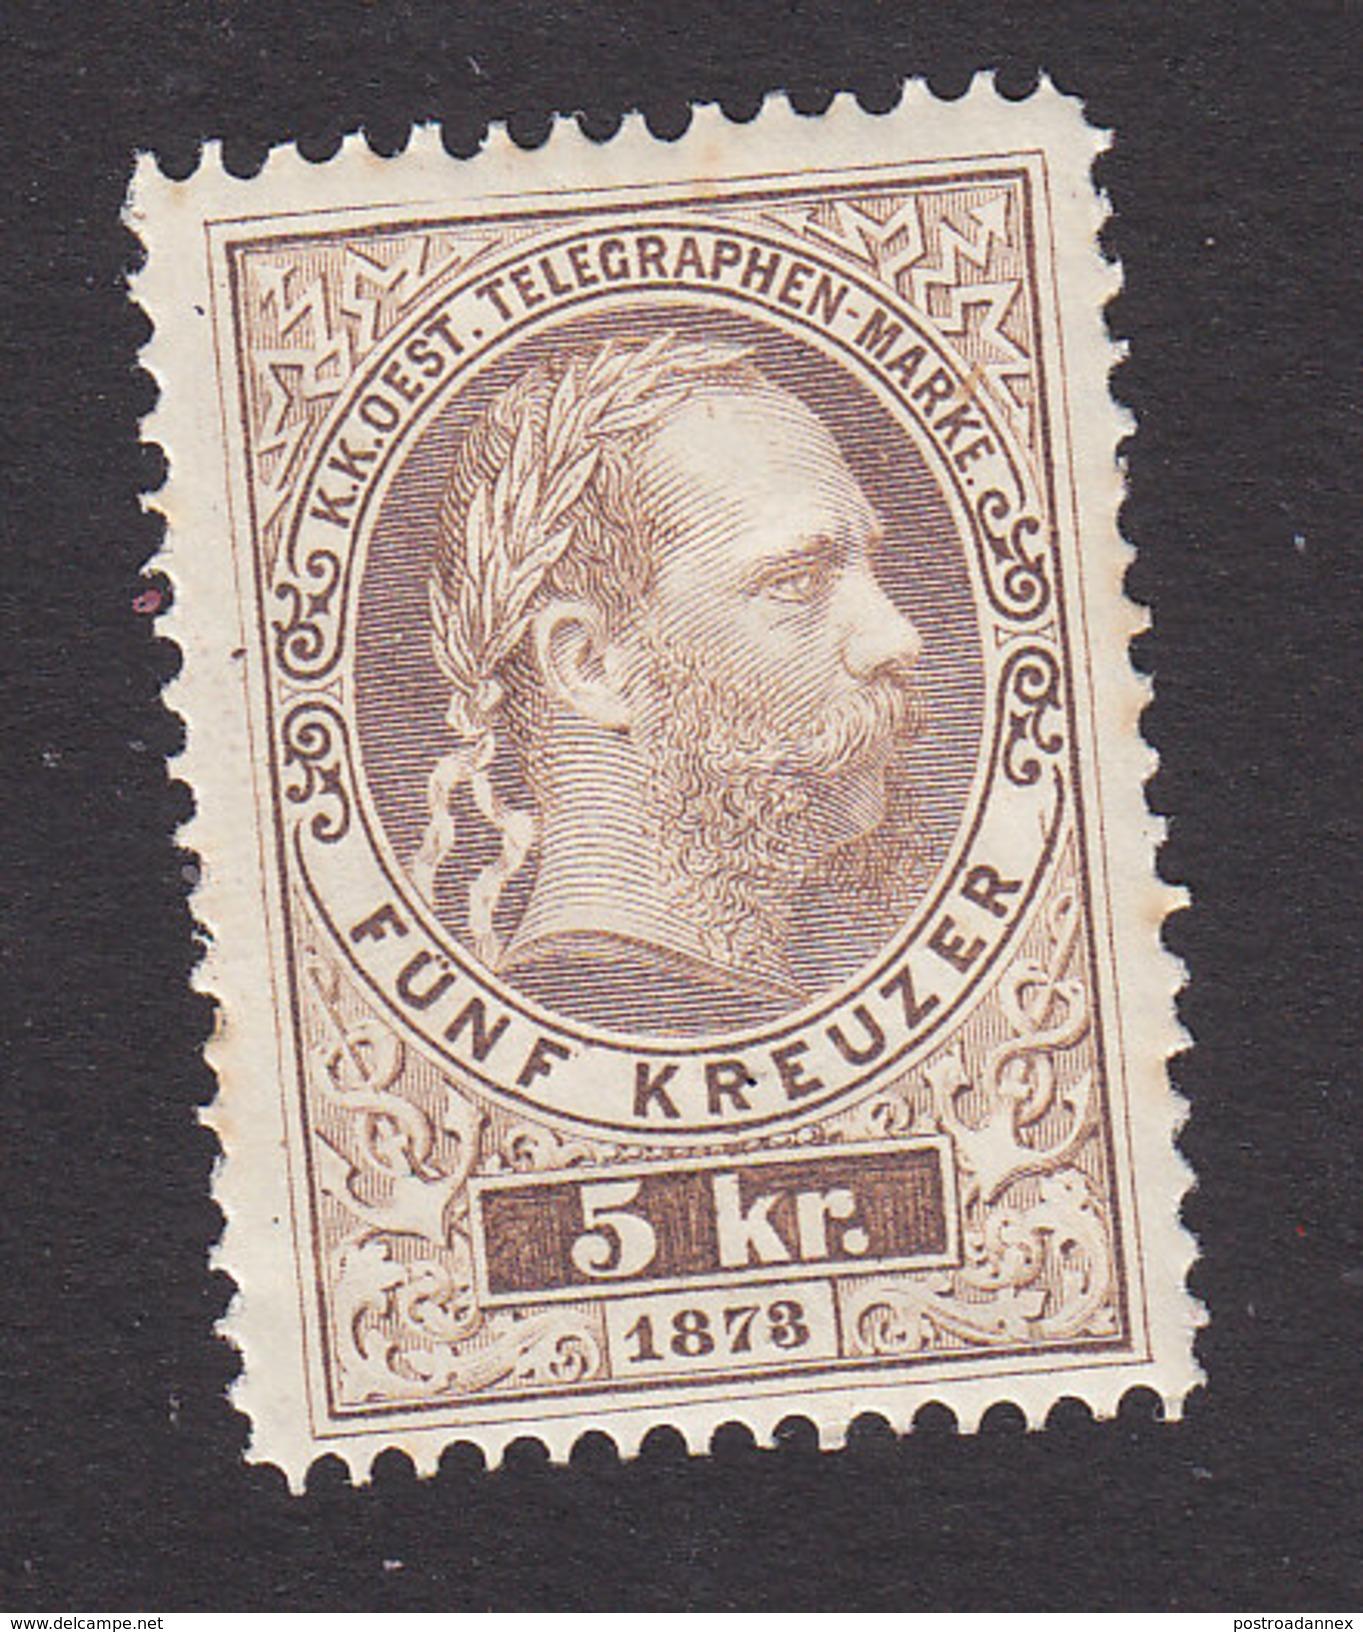 Austria, Scott #Telegraph, Mint Hinged, Franz Josef, Issued 1873 - Telegraph